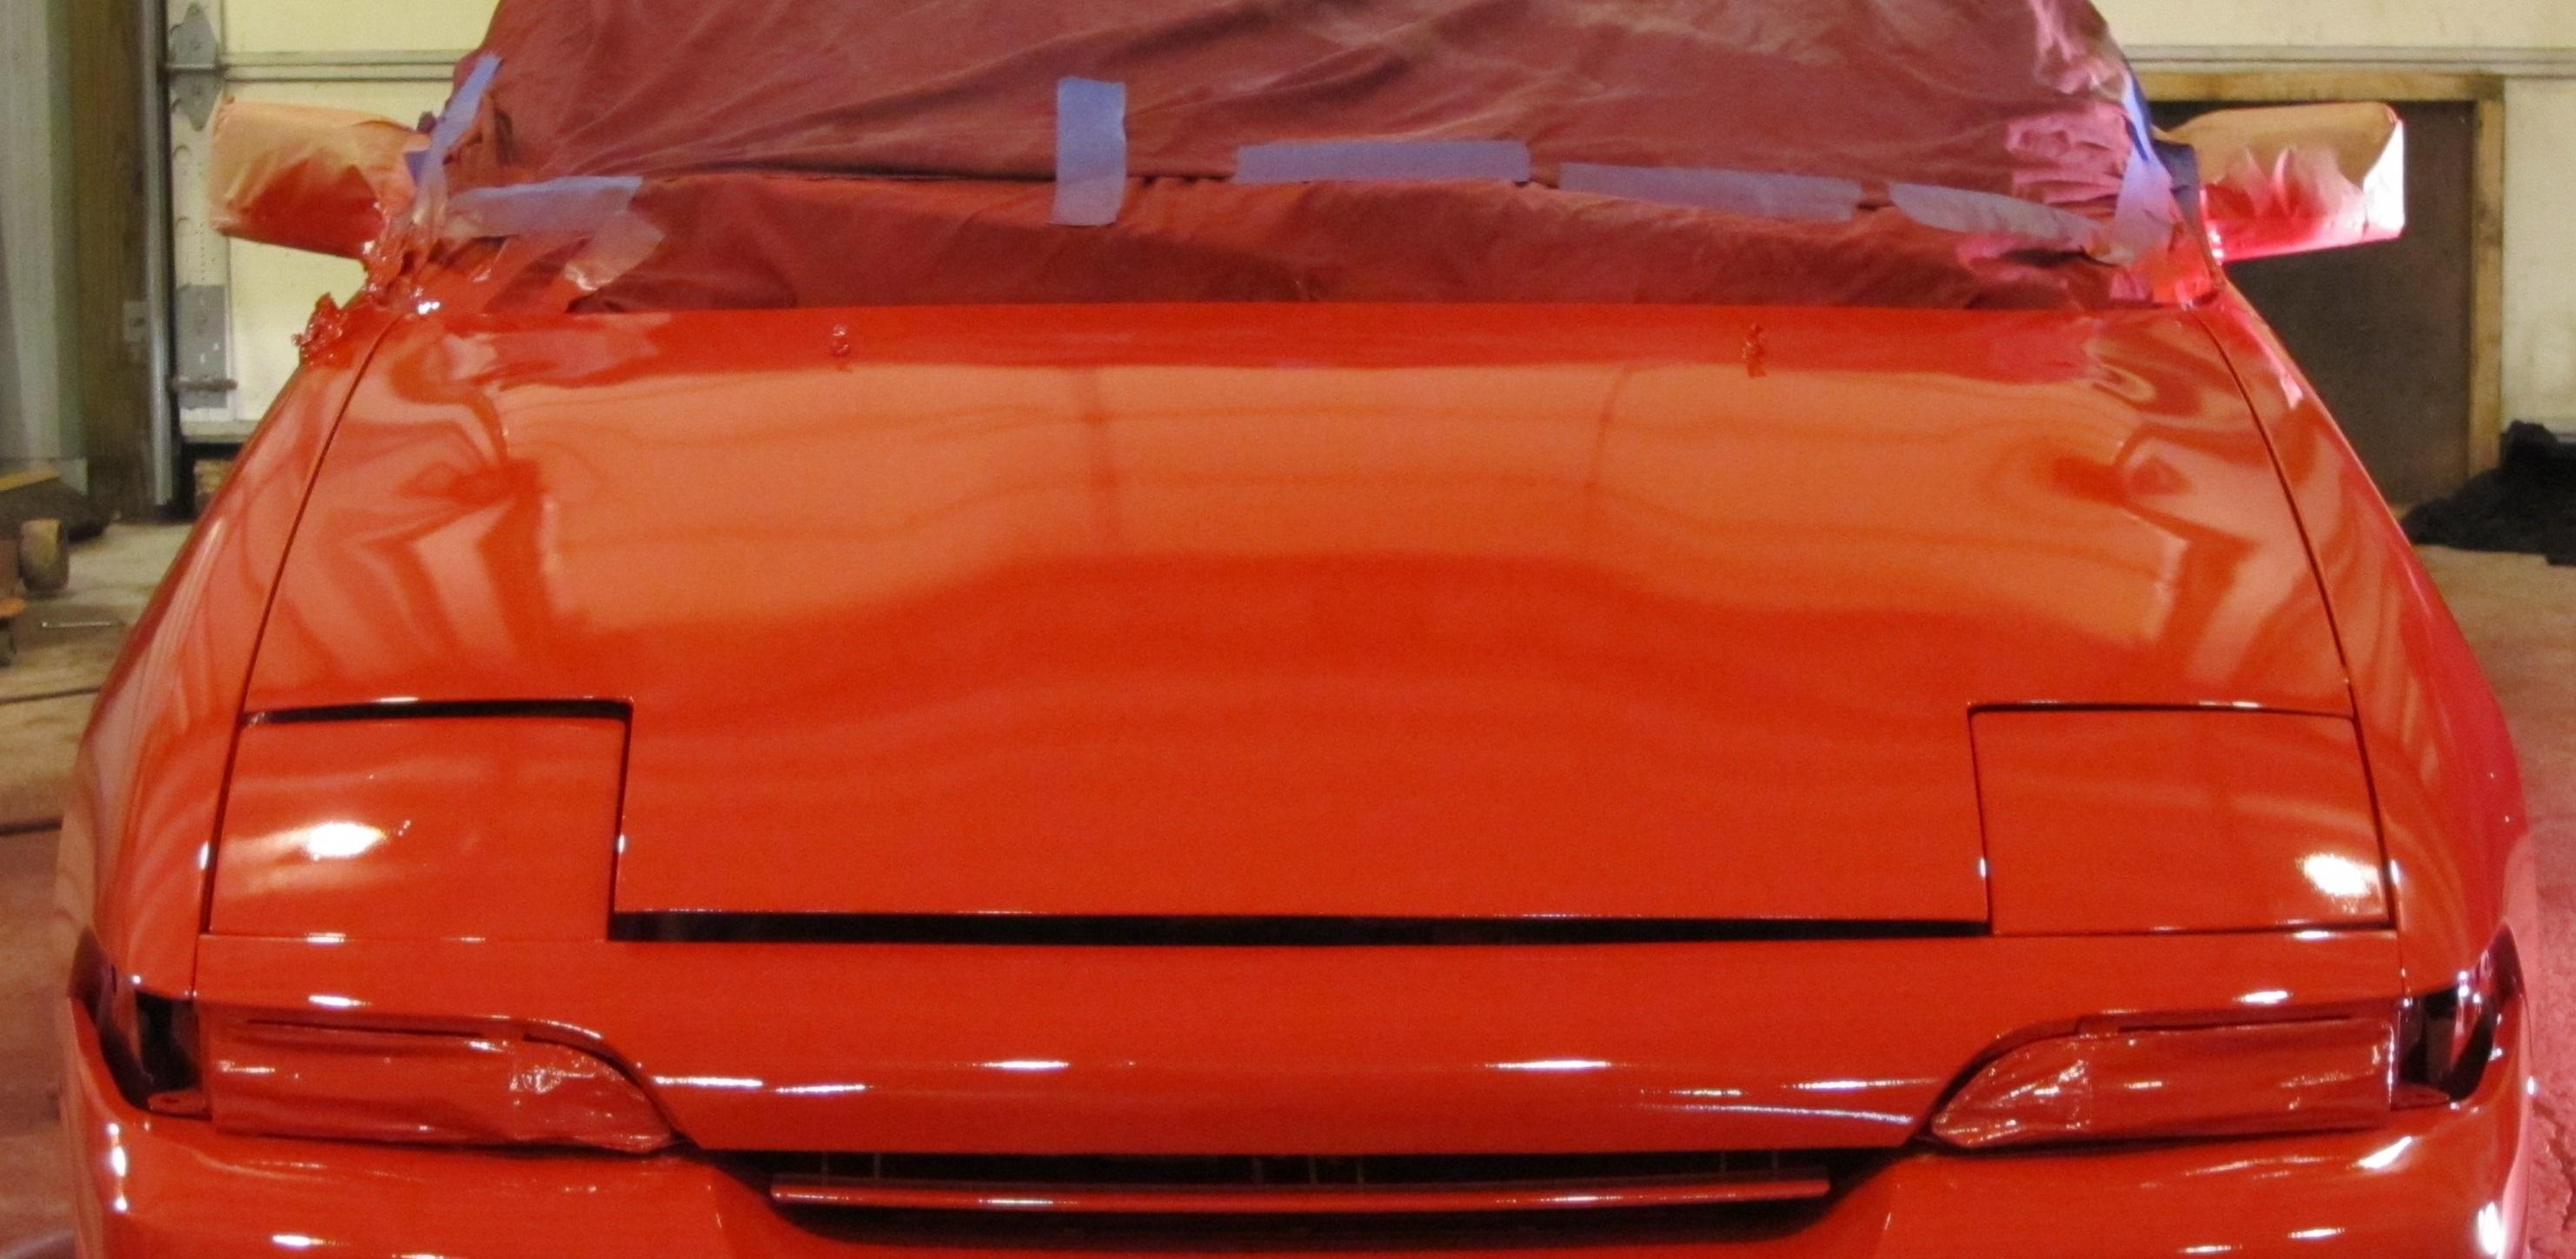 pintura para coches